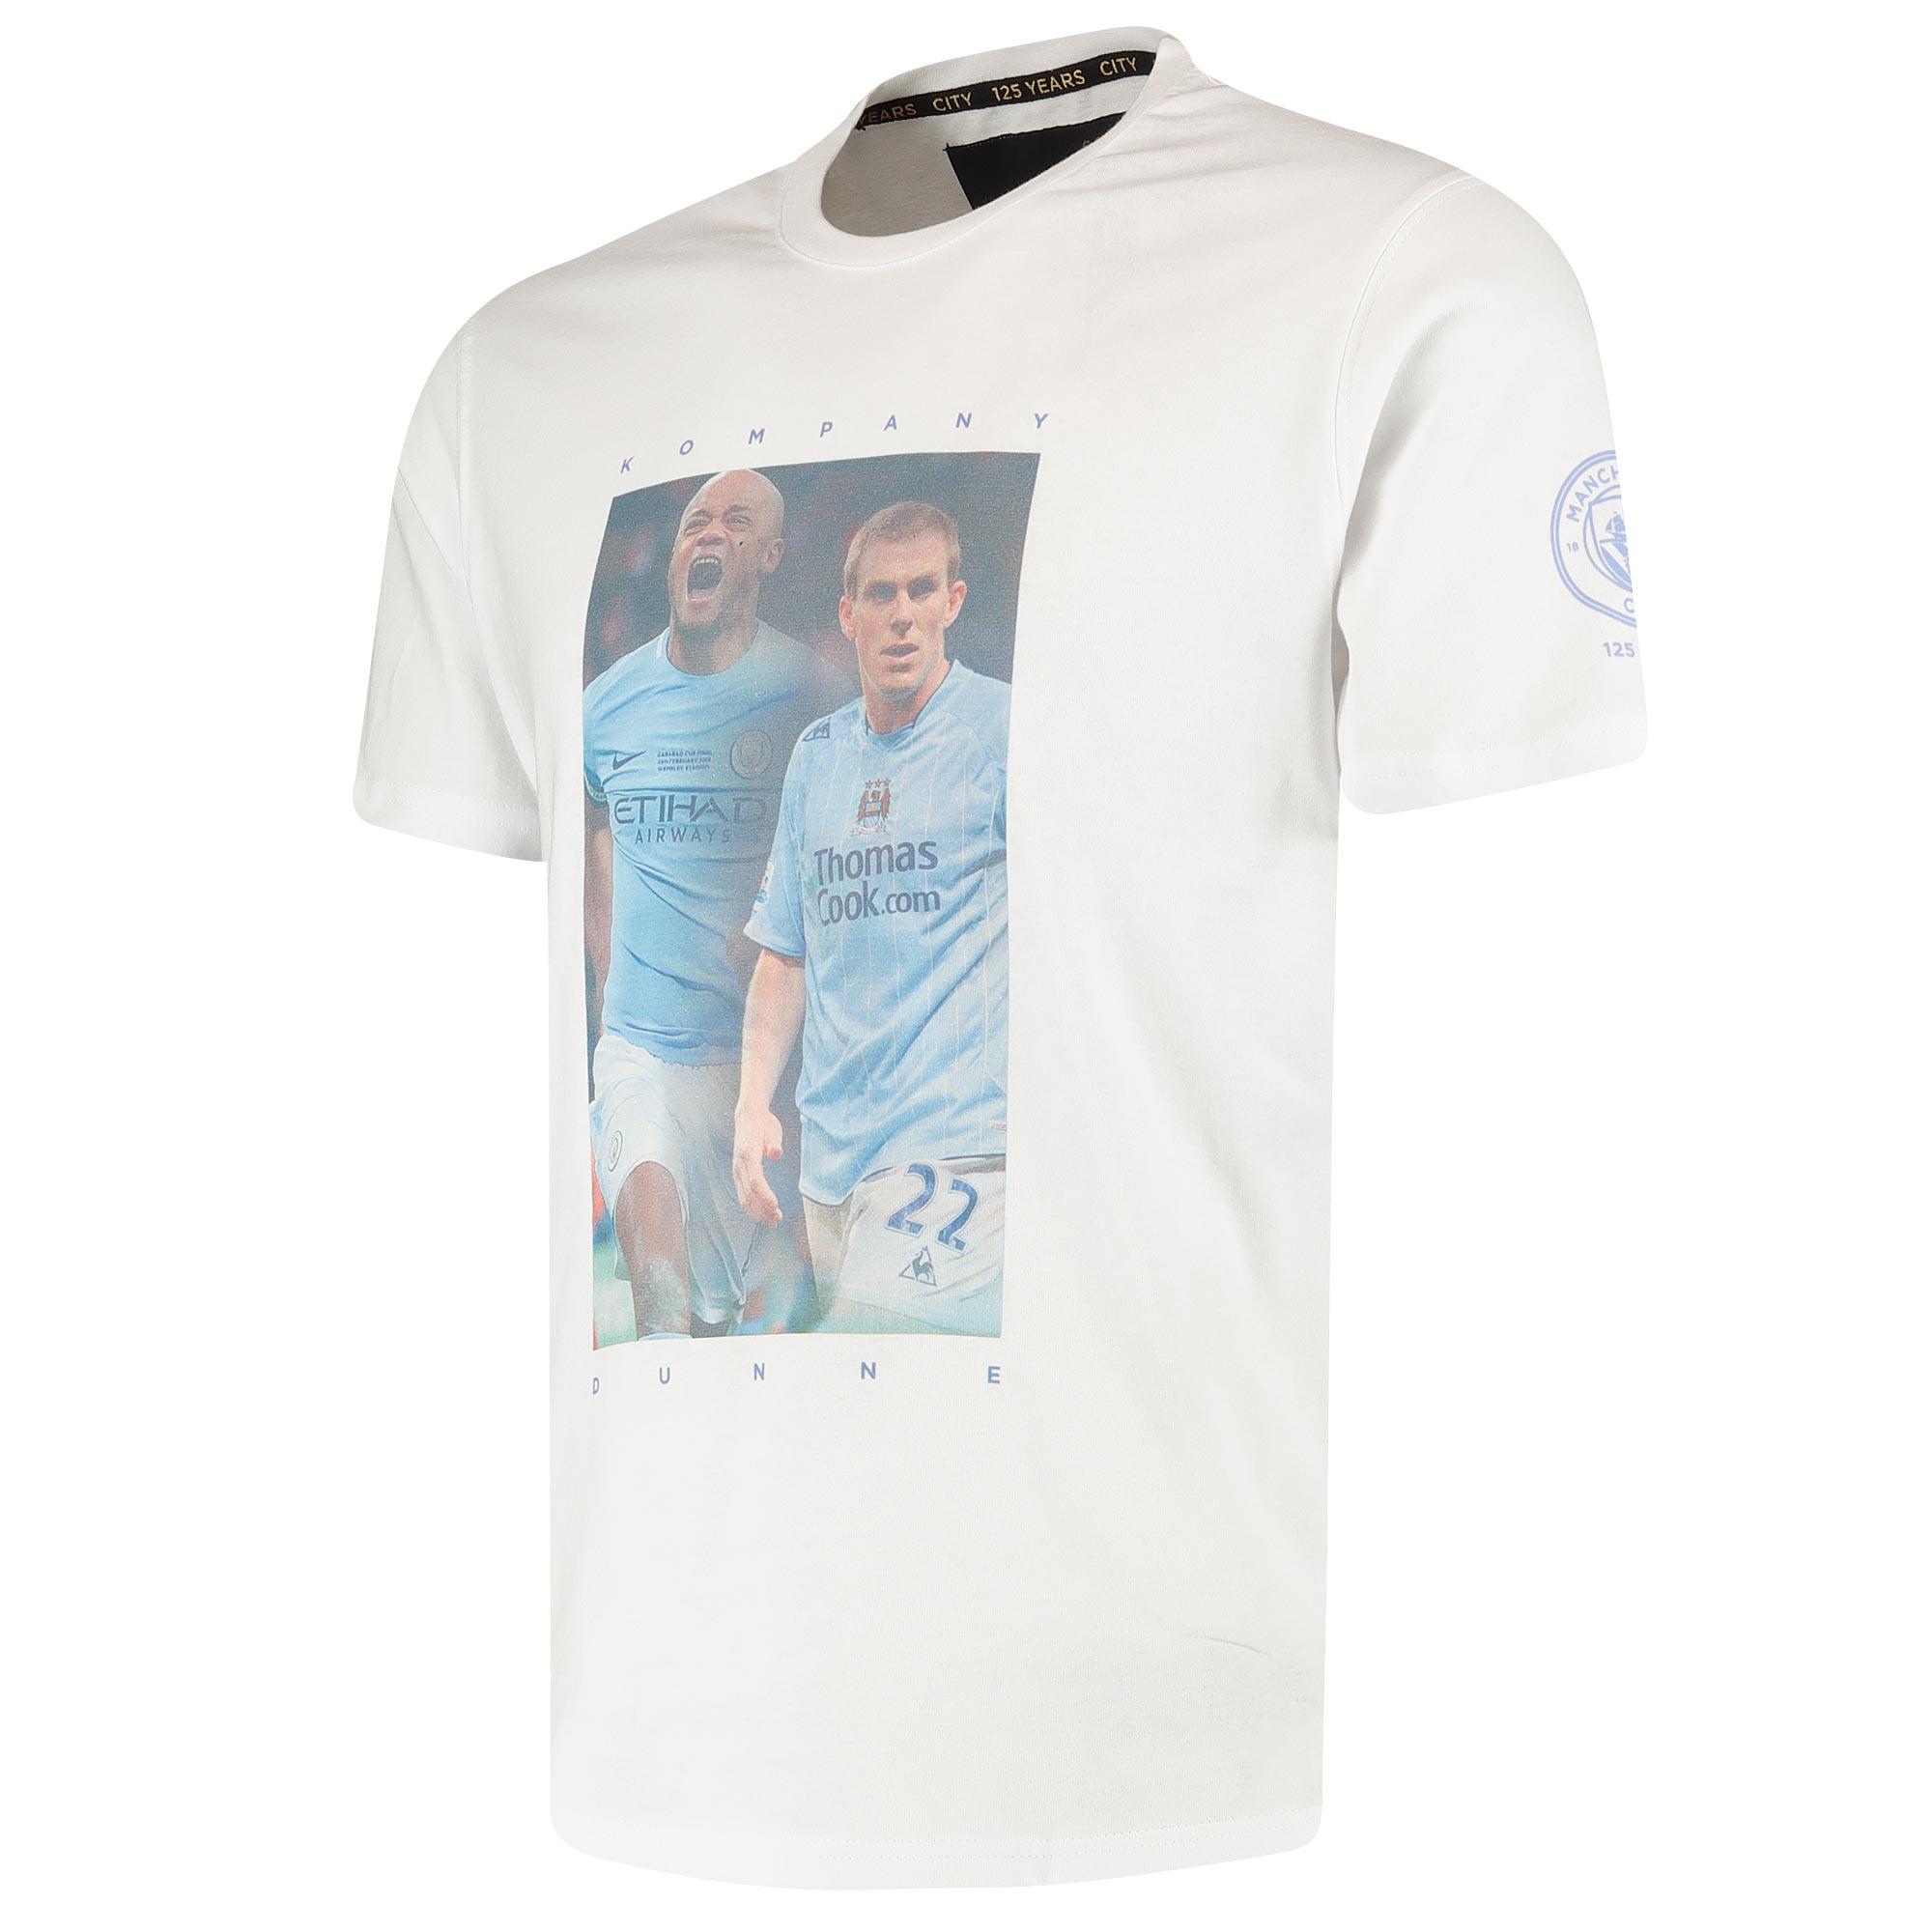 Manchester City Manchester City 125 Years City Heroes Dunne / Kompany T Shirt - White - Unisex